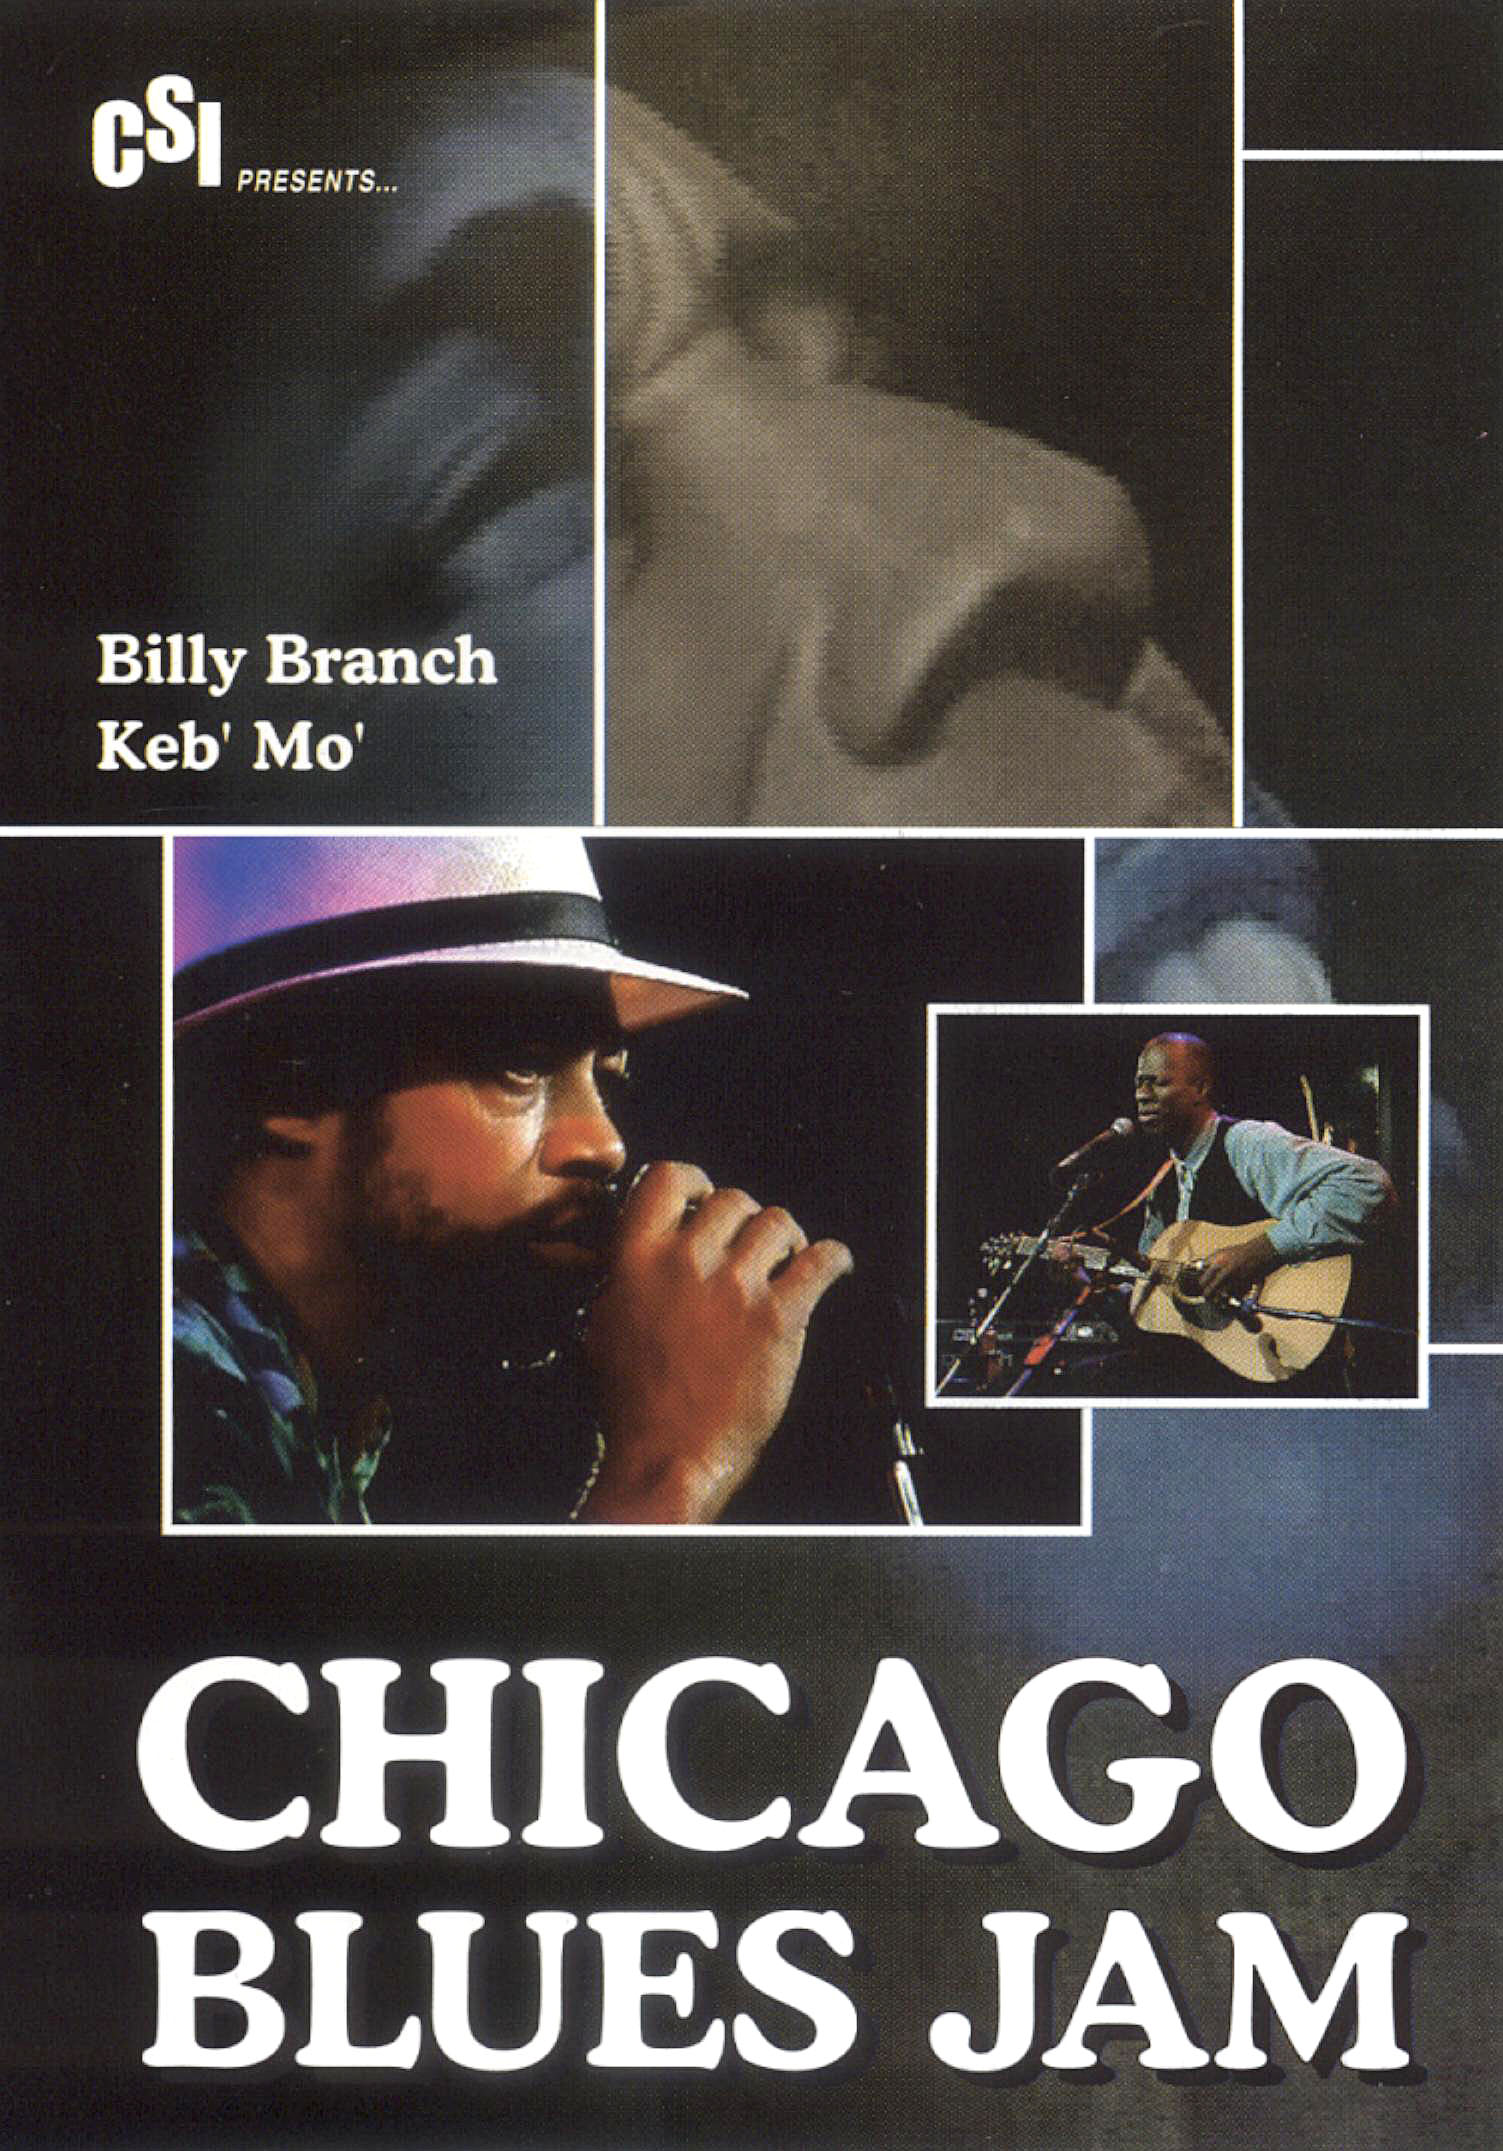 Chicago Blues Jam: Billy Branch/Keb Mo